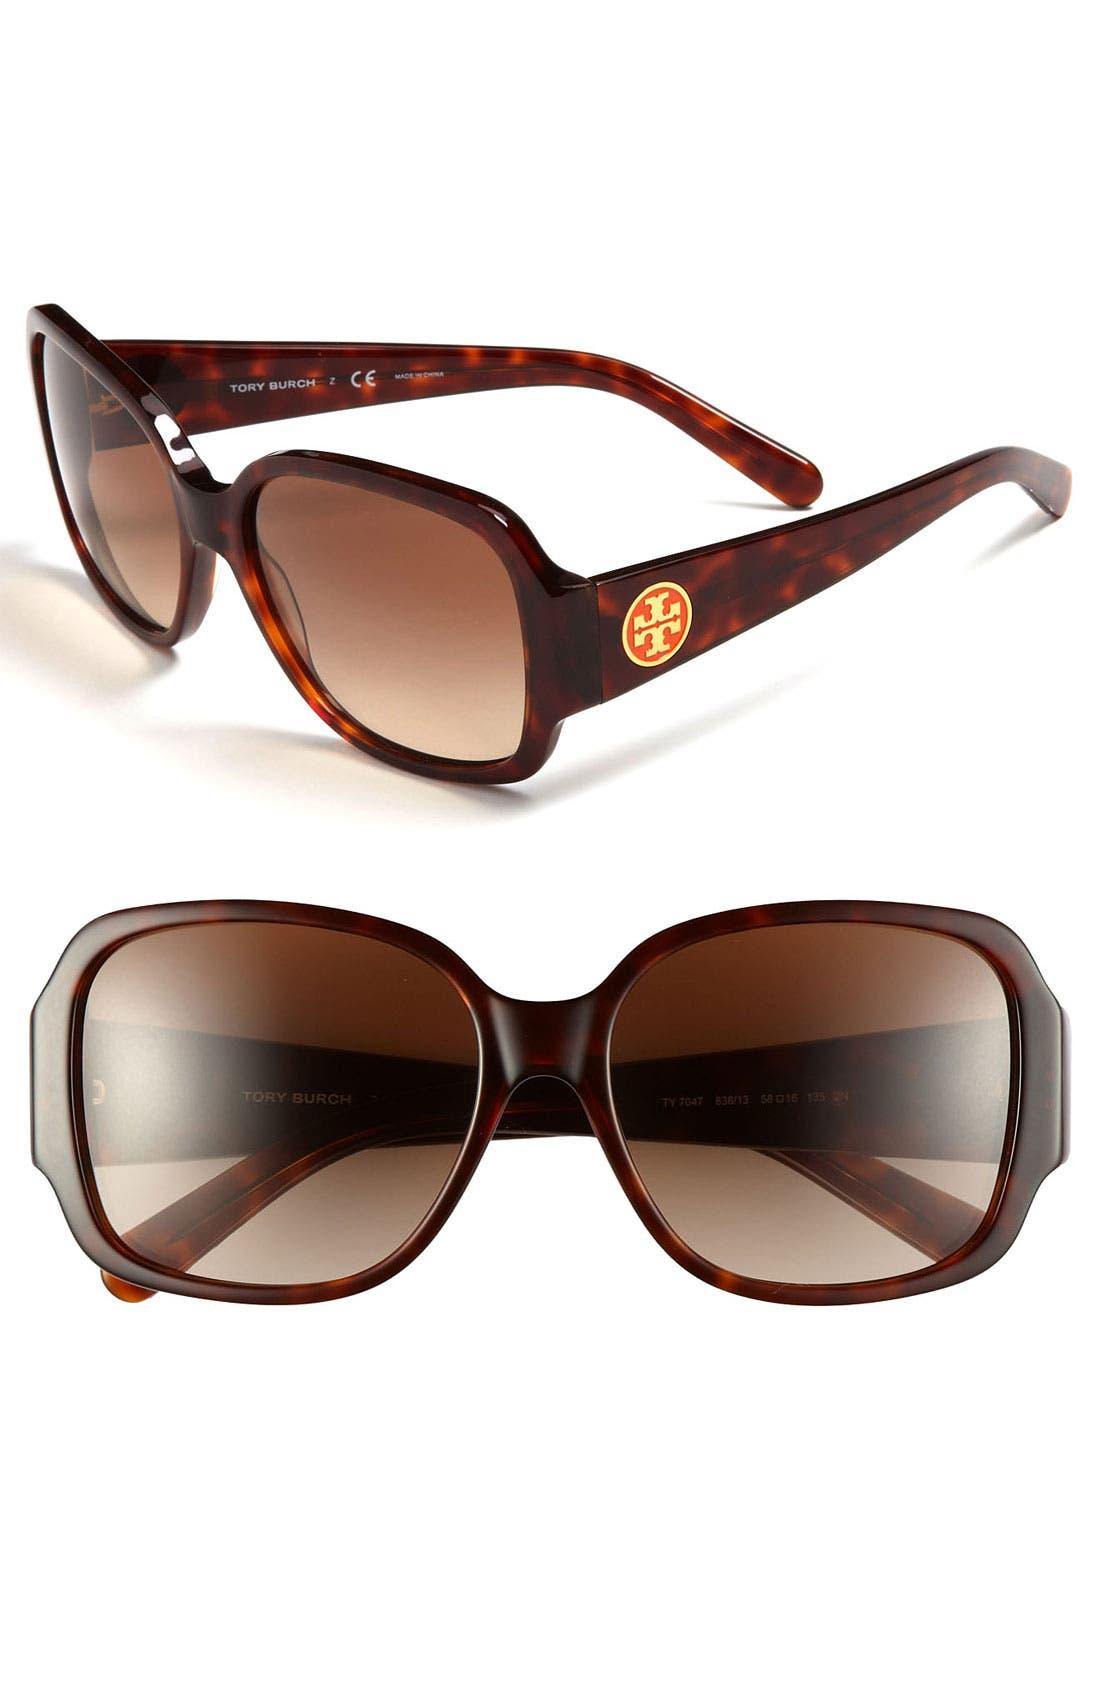 Main Image - Tory Burch 'Glam' 58mm Sunglasses